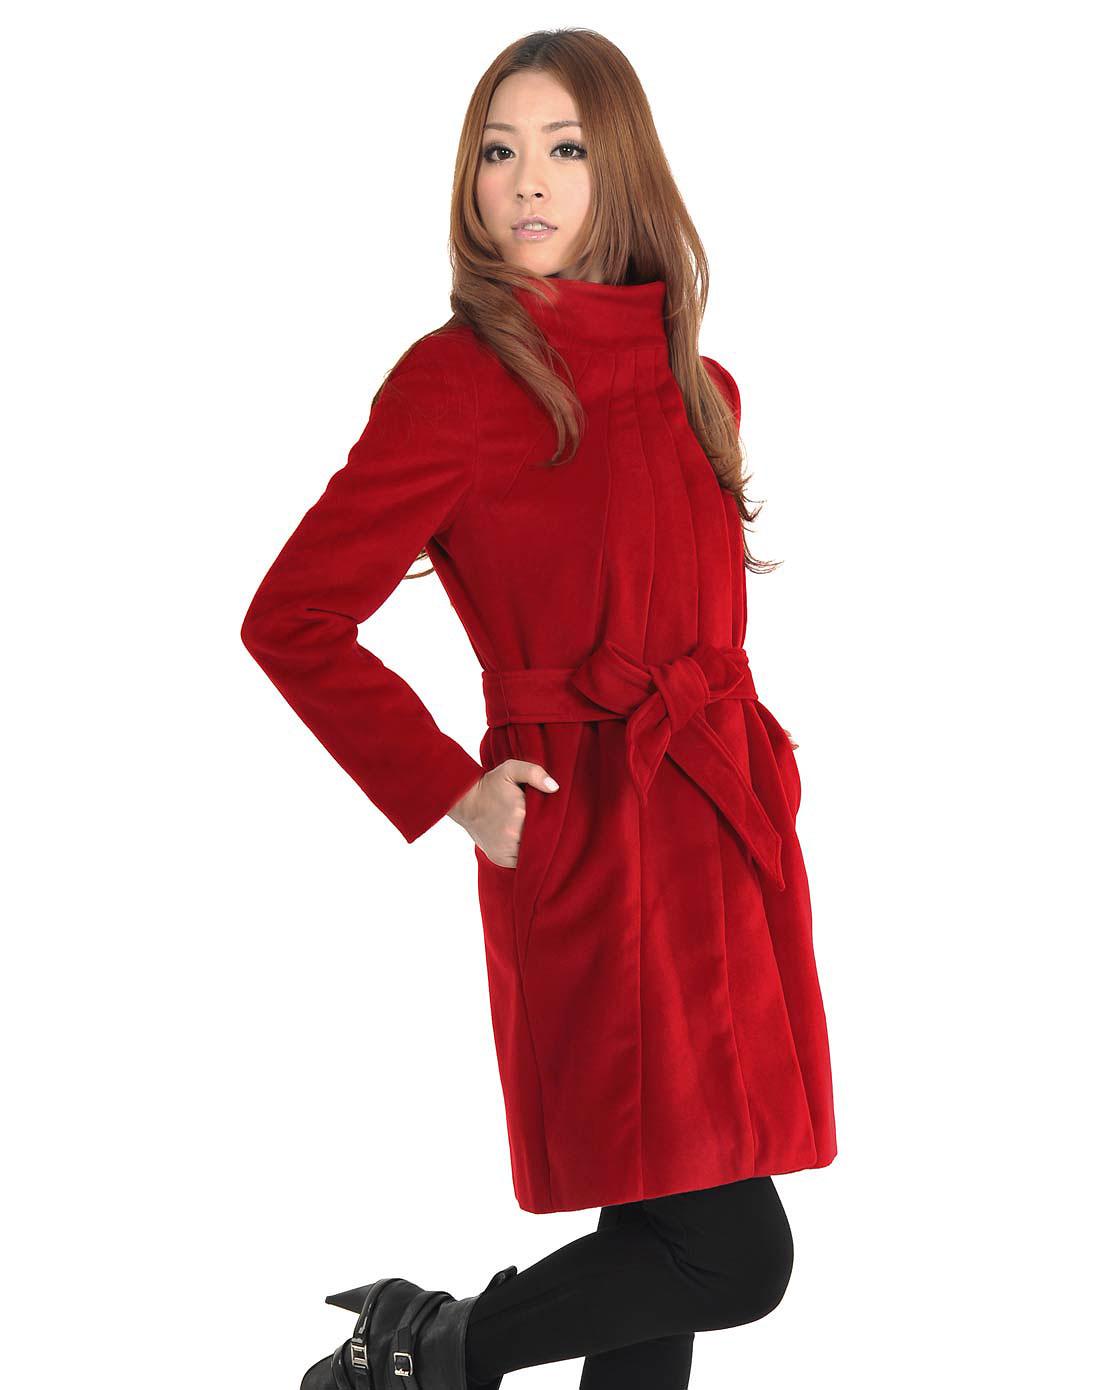 sa红色韩版长款外套毛呢大衣sd9080240